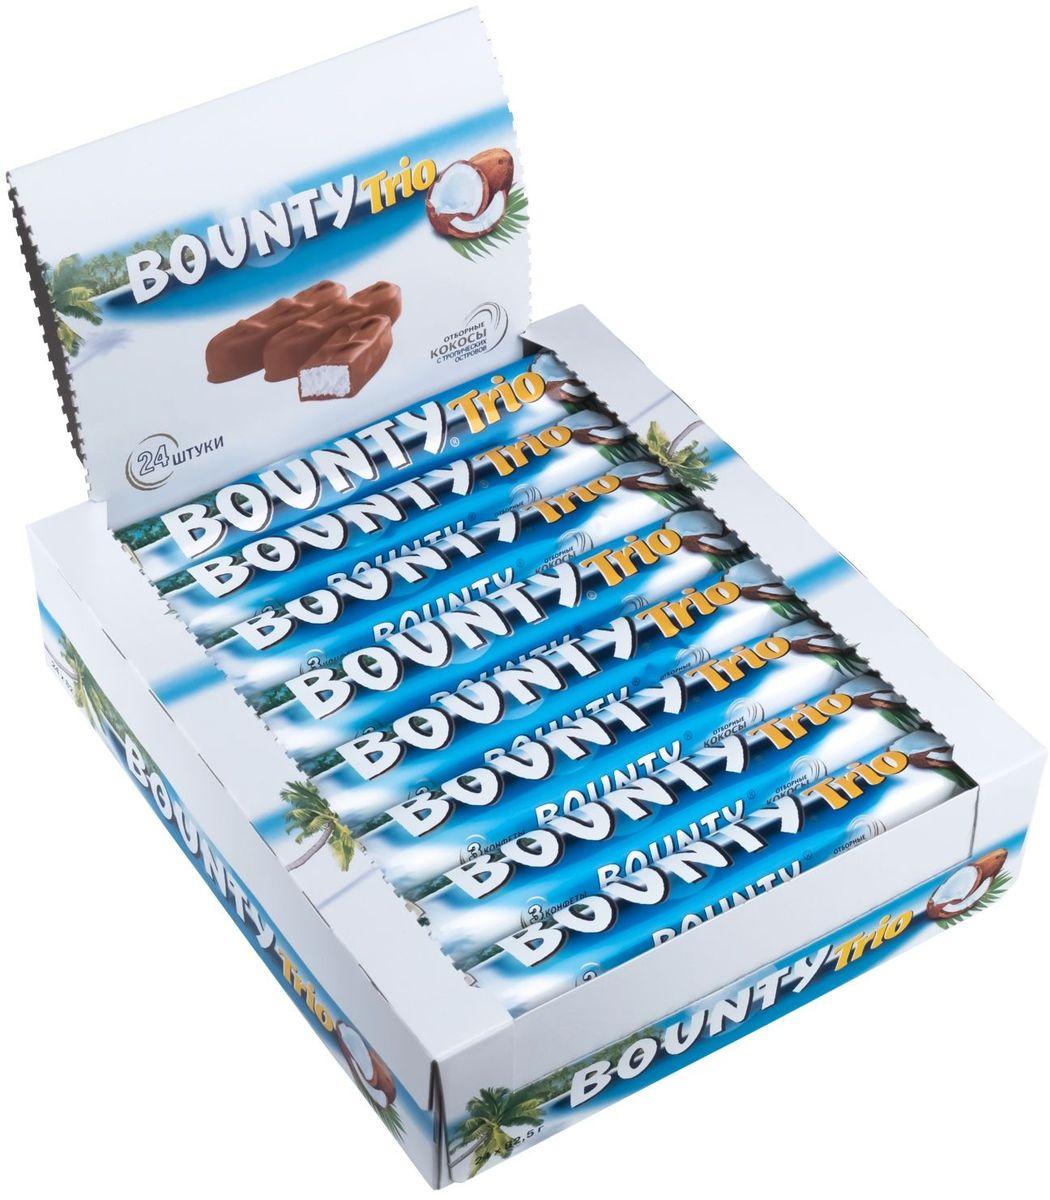 Bounty Trio шоколадный батончик, 24 шт по 82,5 г bounty trio шоколадный батончик 82 5 г